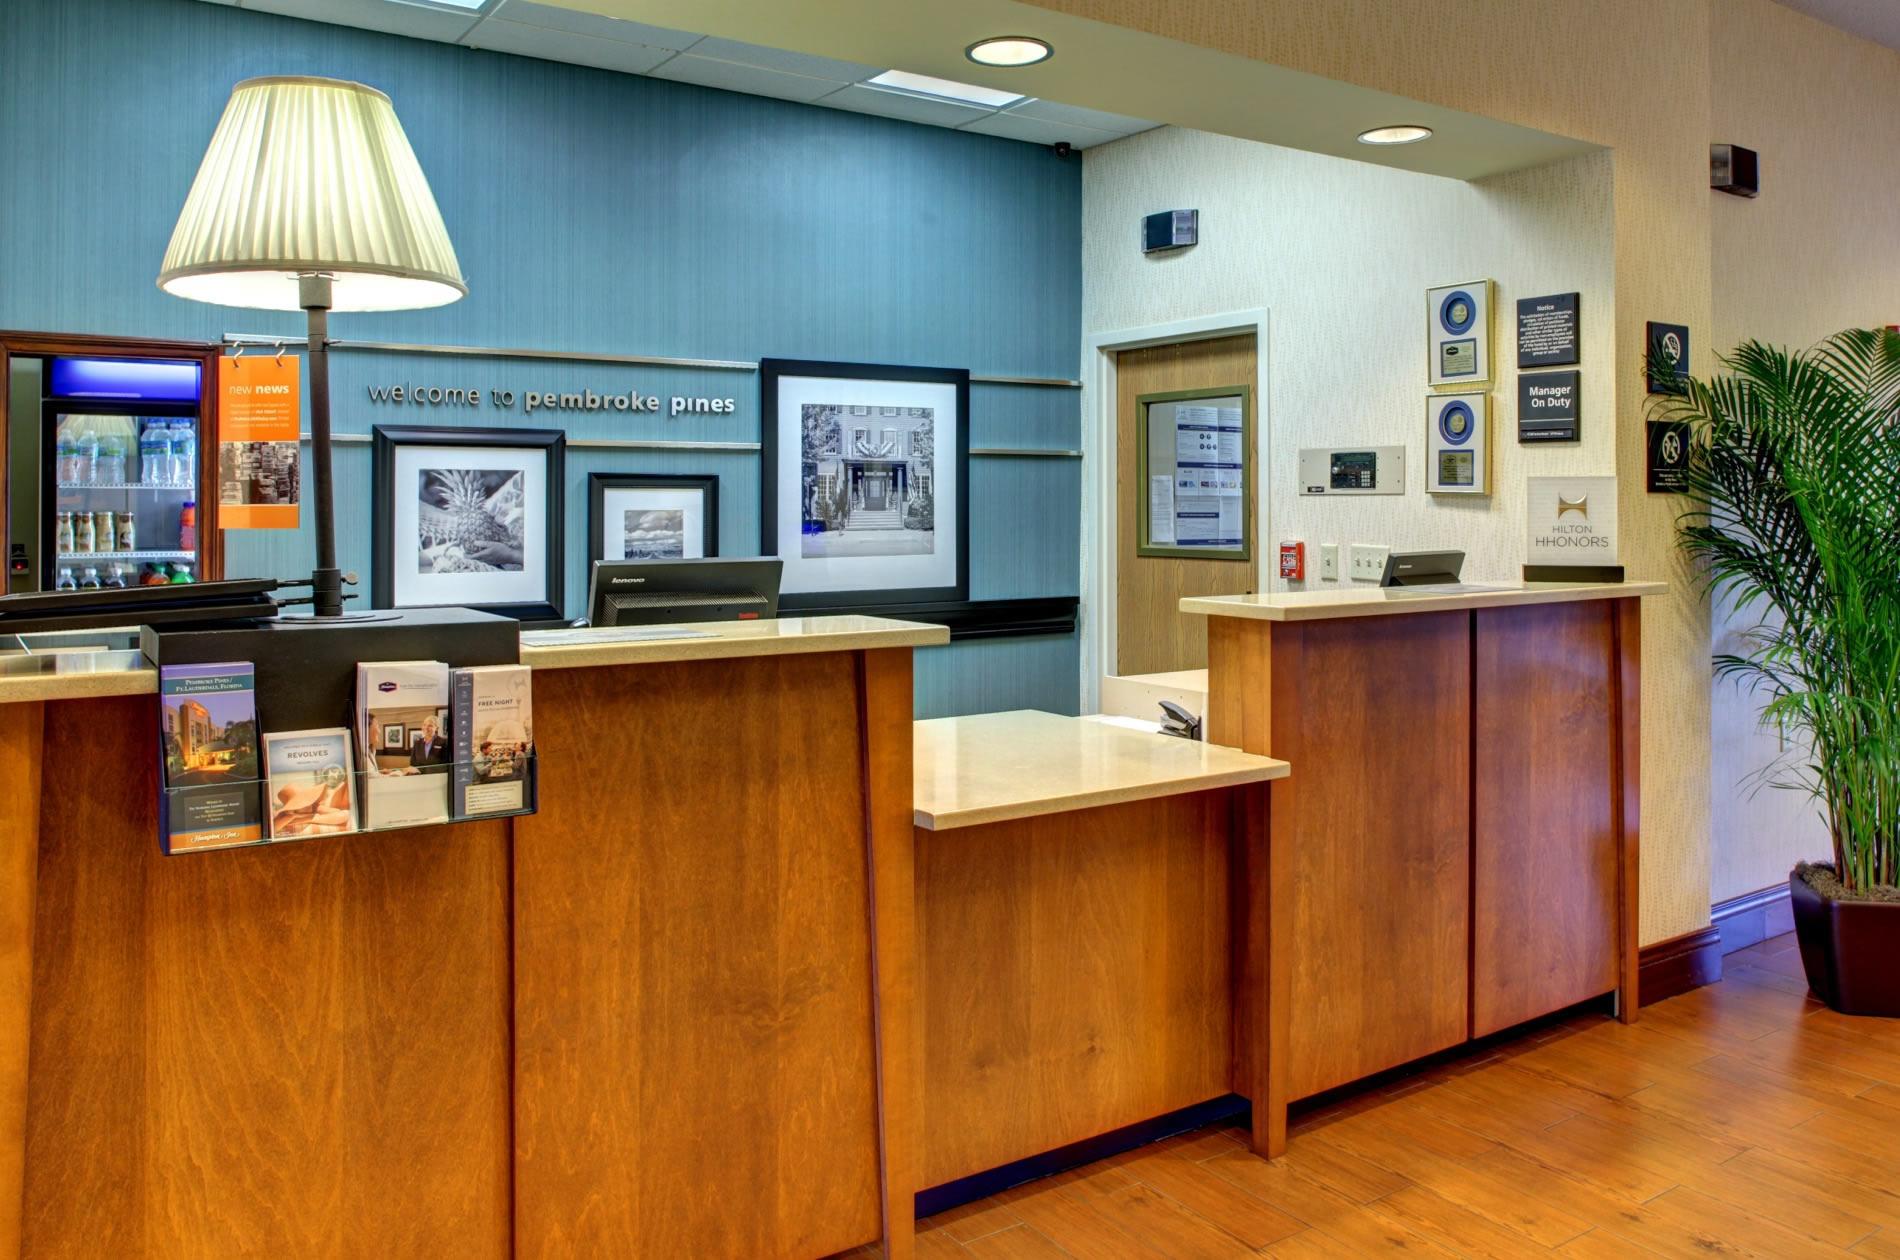 Hampton Inn by Hilton Pembroke Pines - Fort Lauderdale West image 1